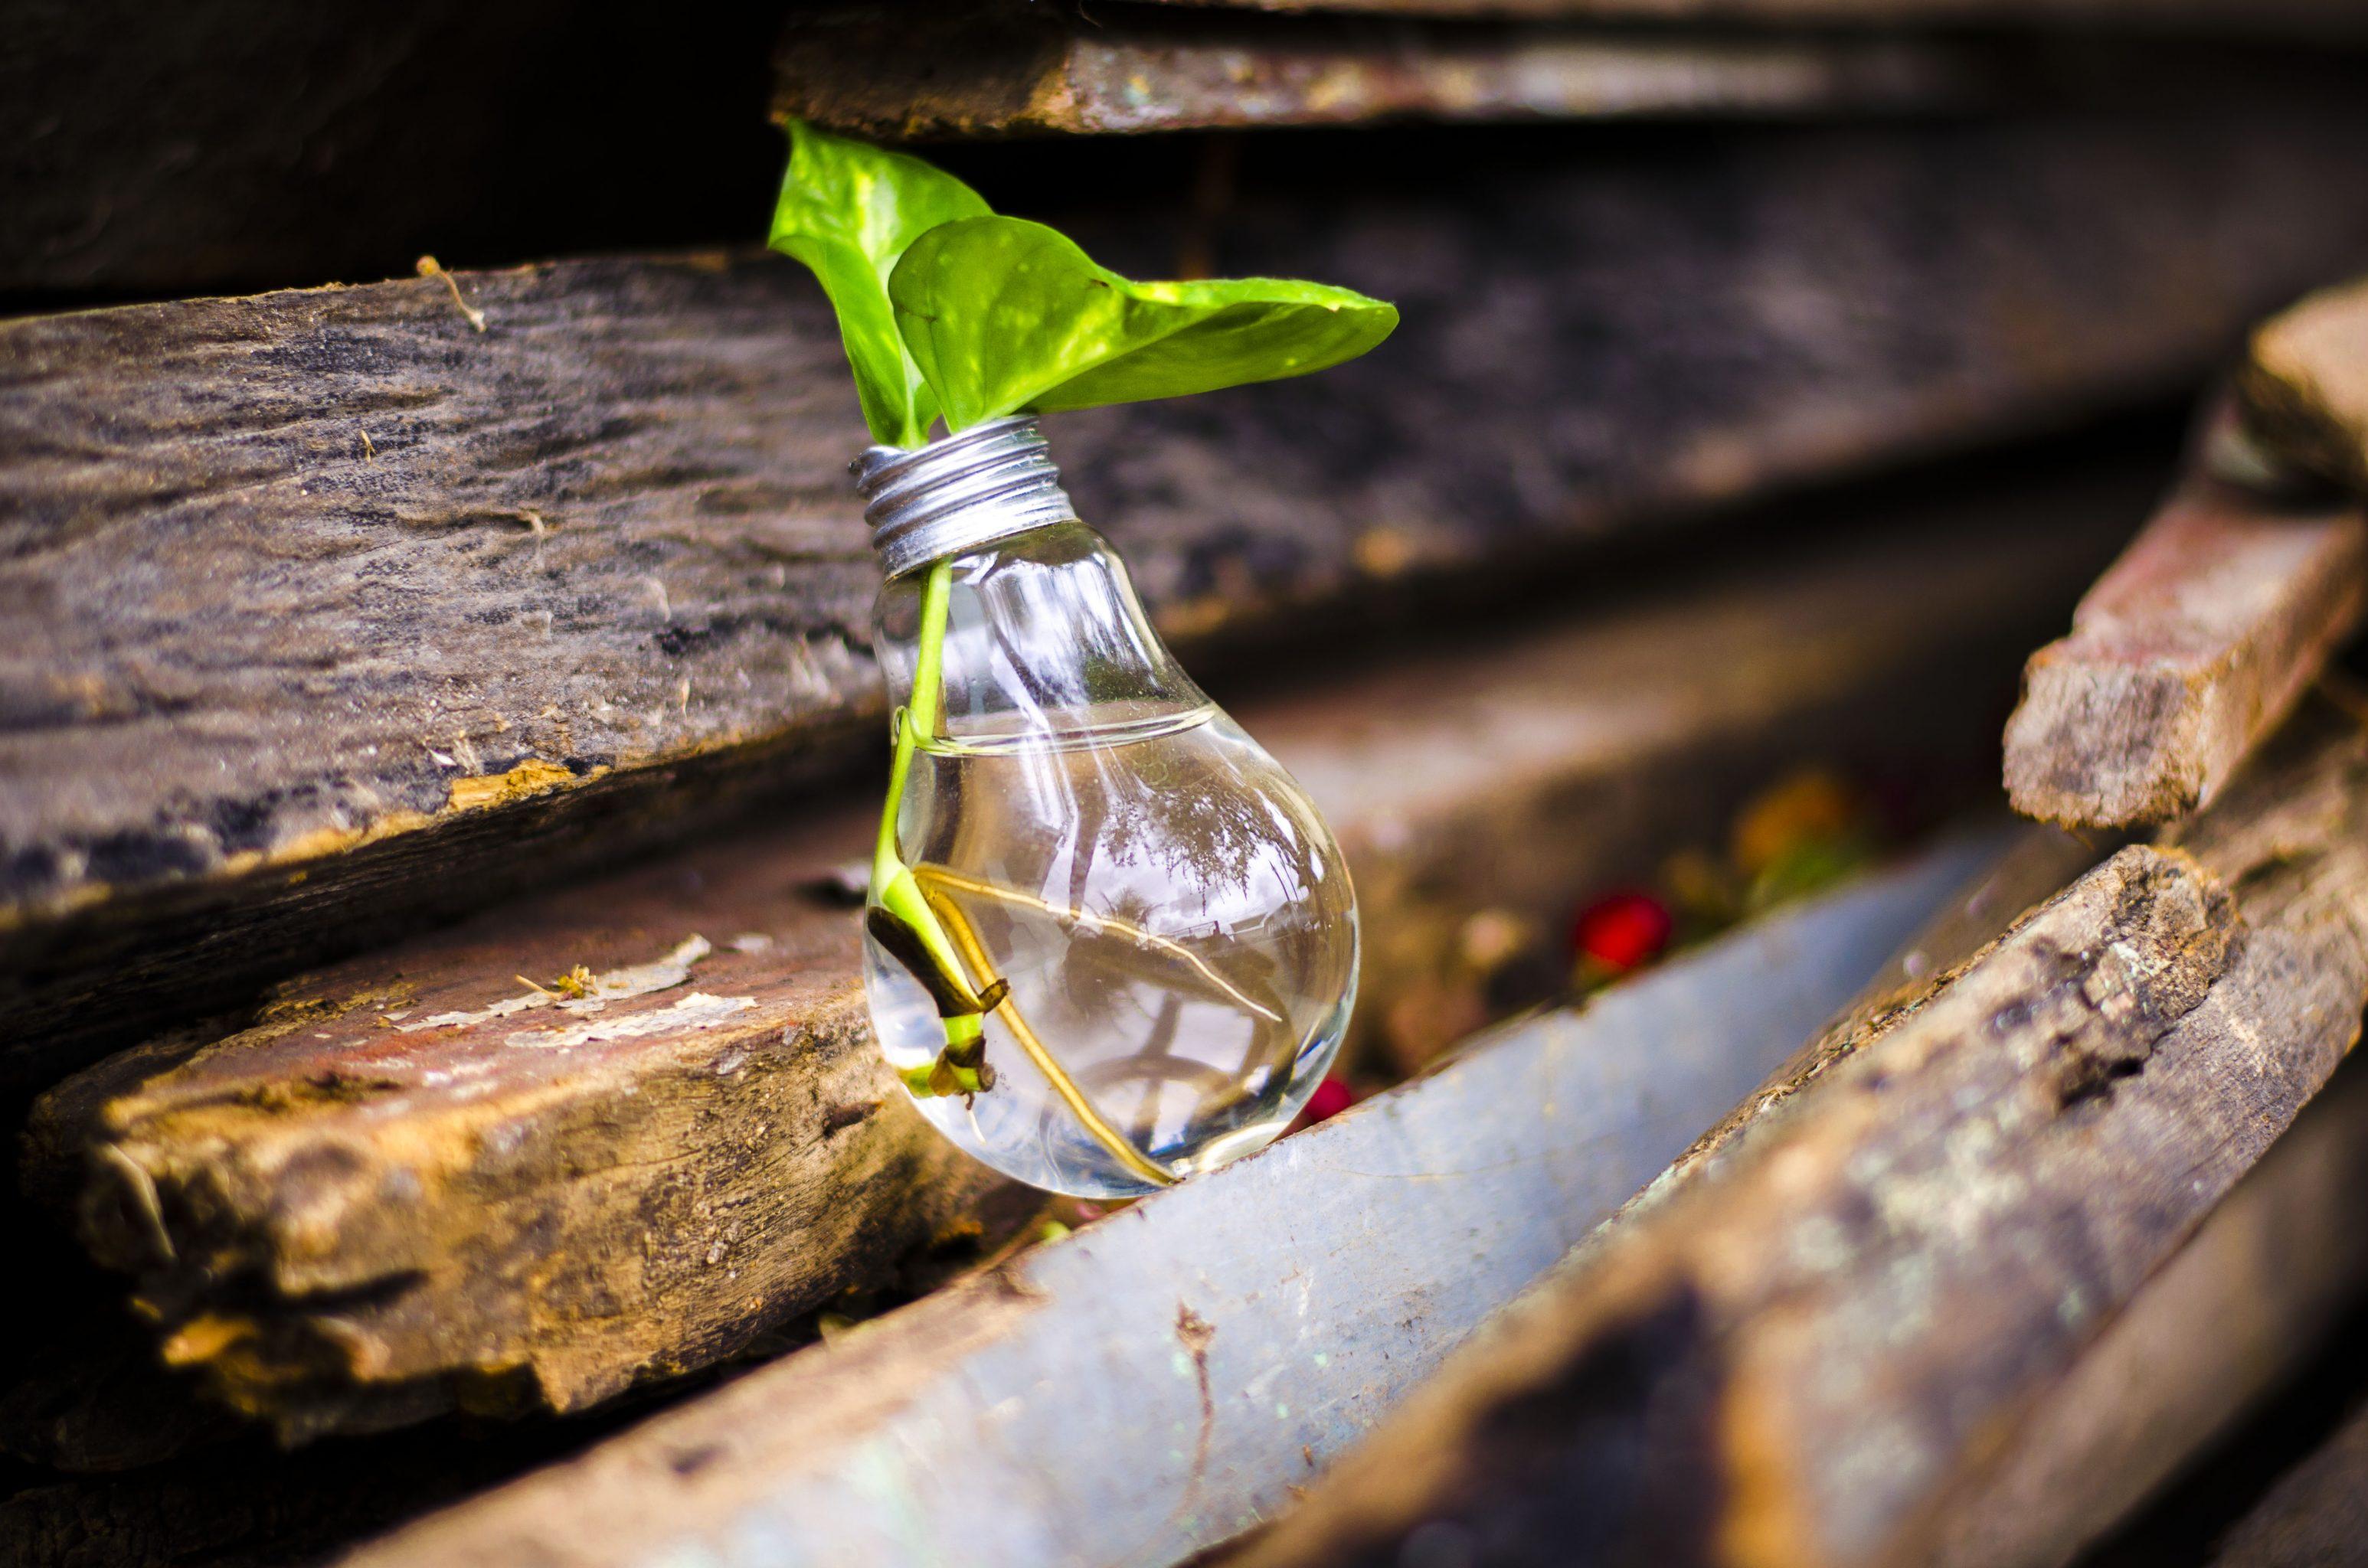 The Best 10+ Practical Green Tips for Aspiring Eco-Moms